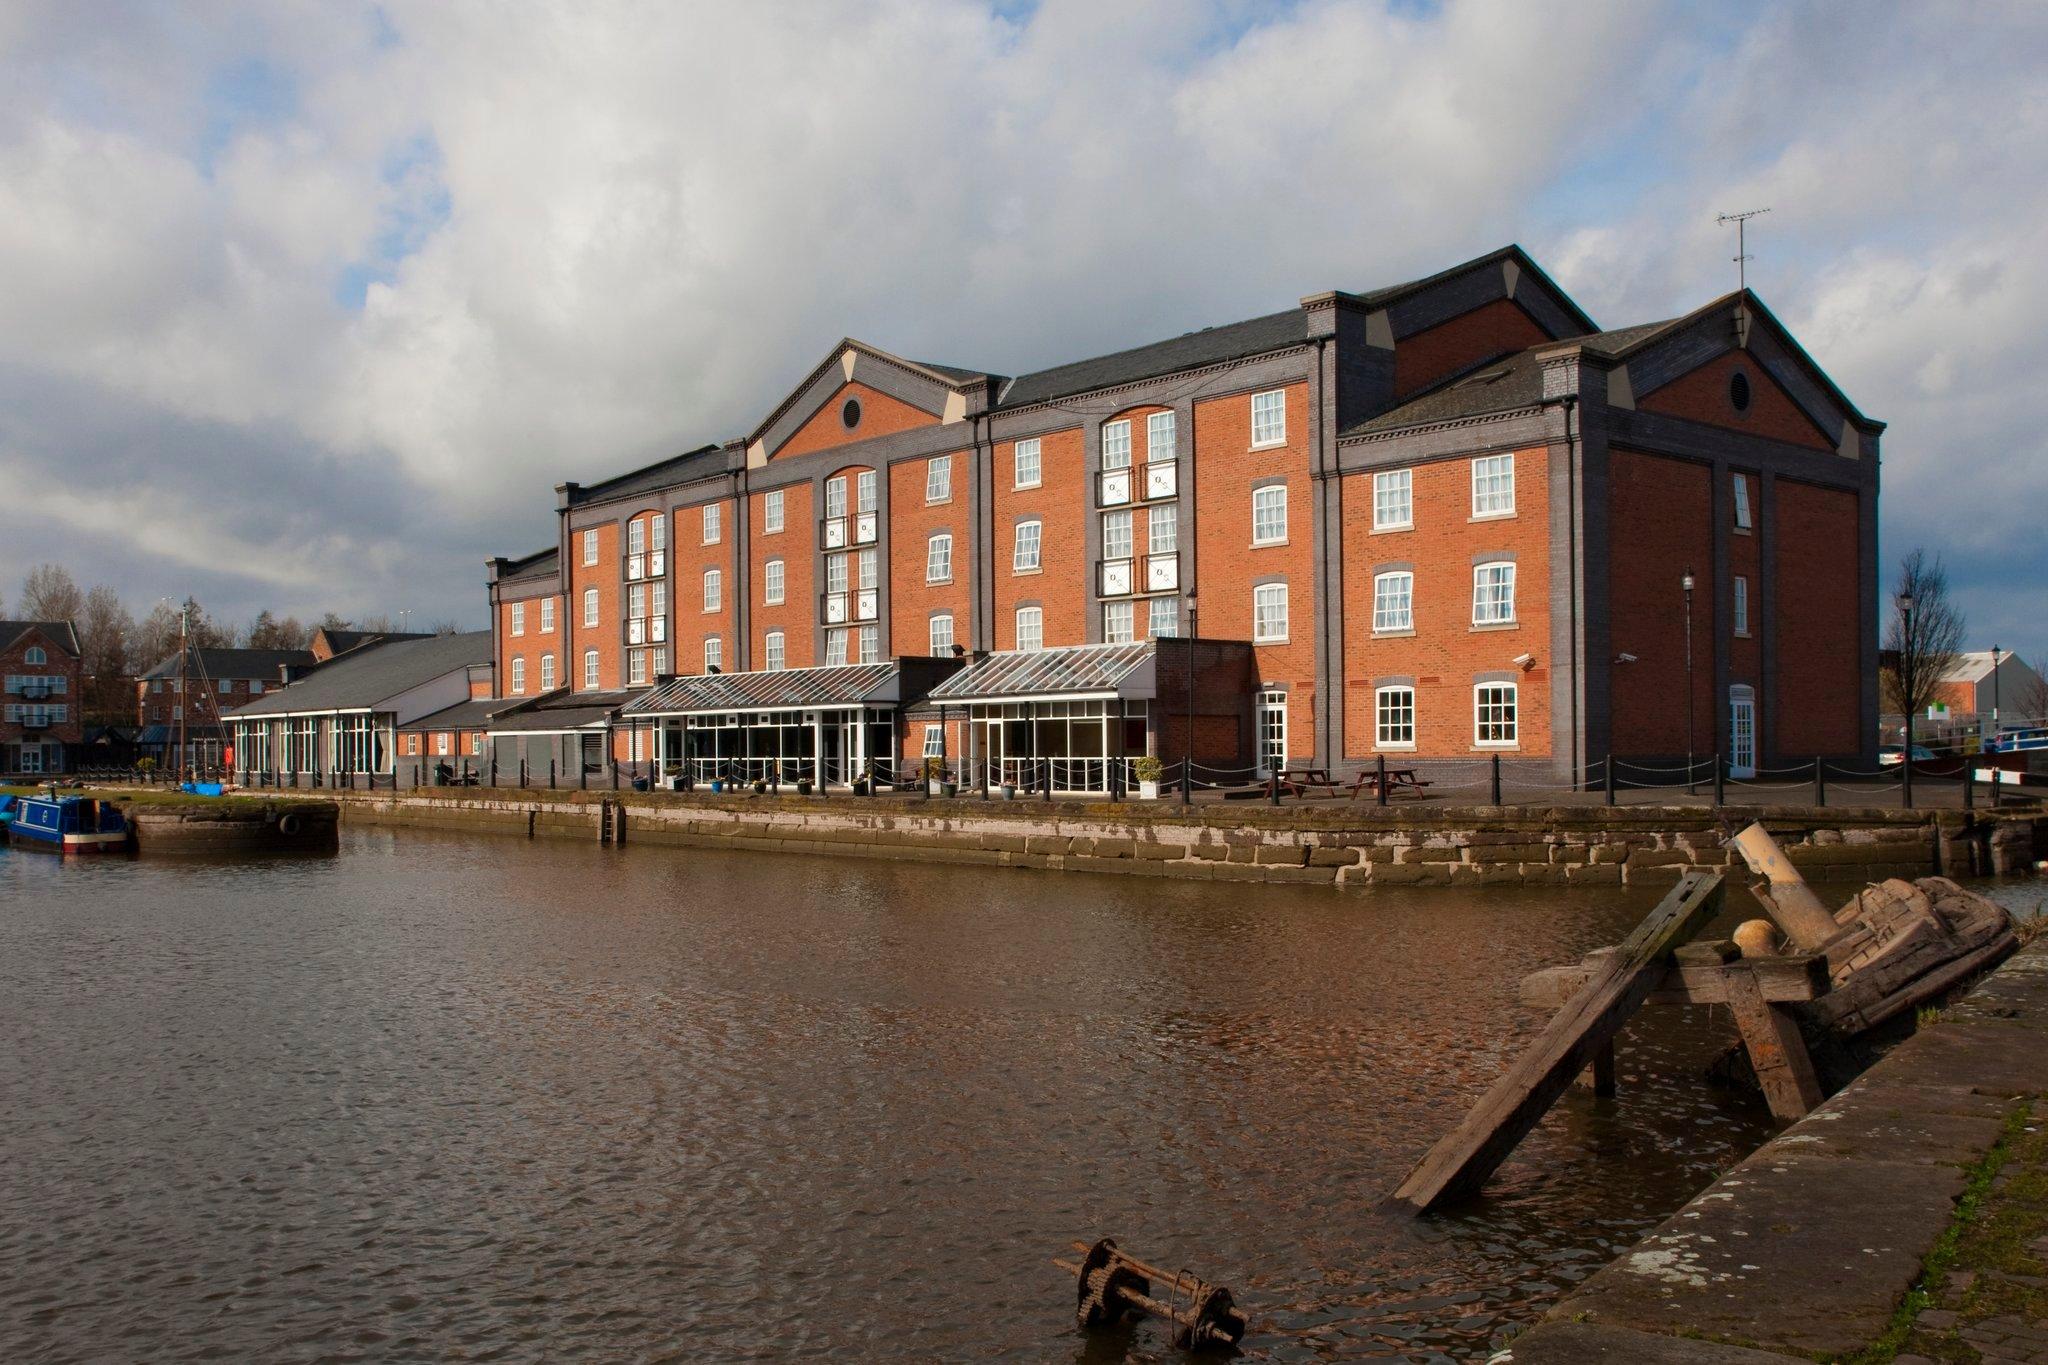 Holiday Inn Ellesmere / Cheshire Oaks